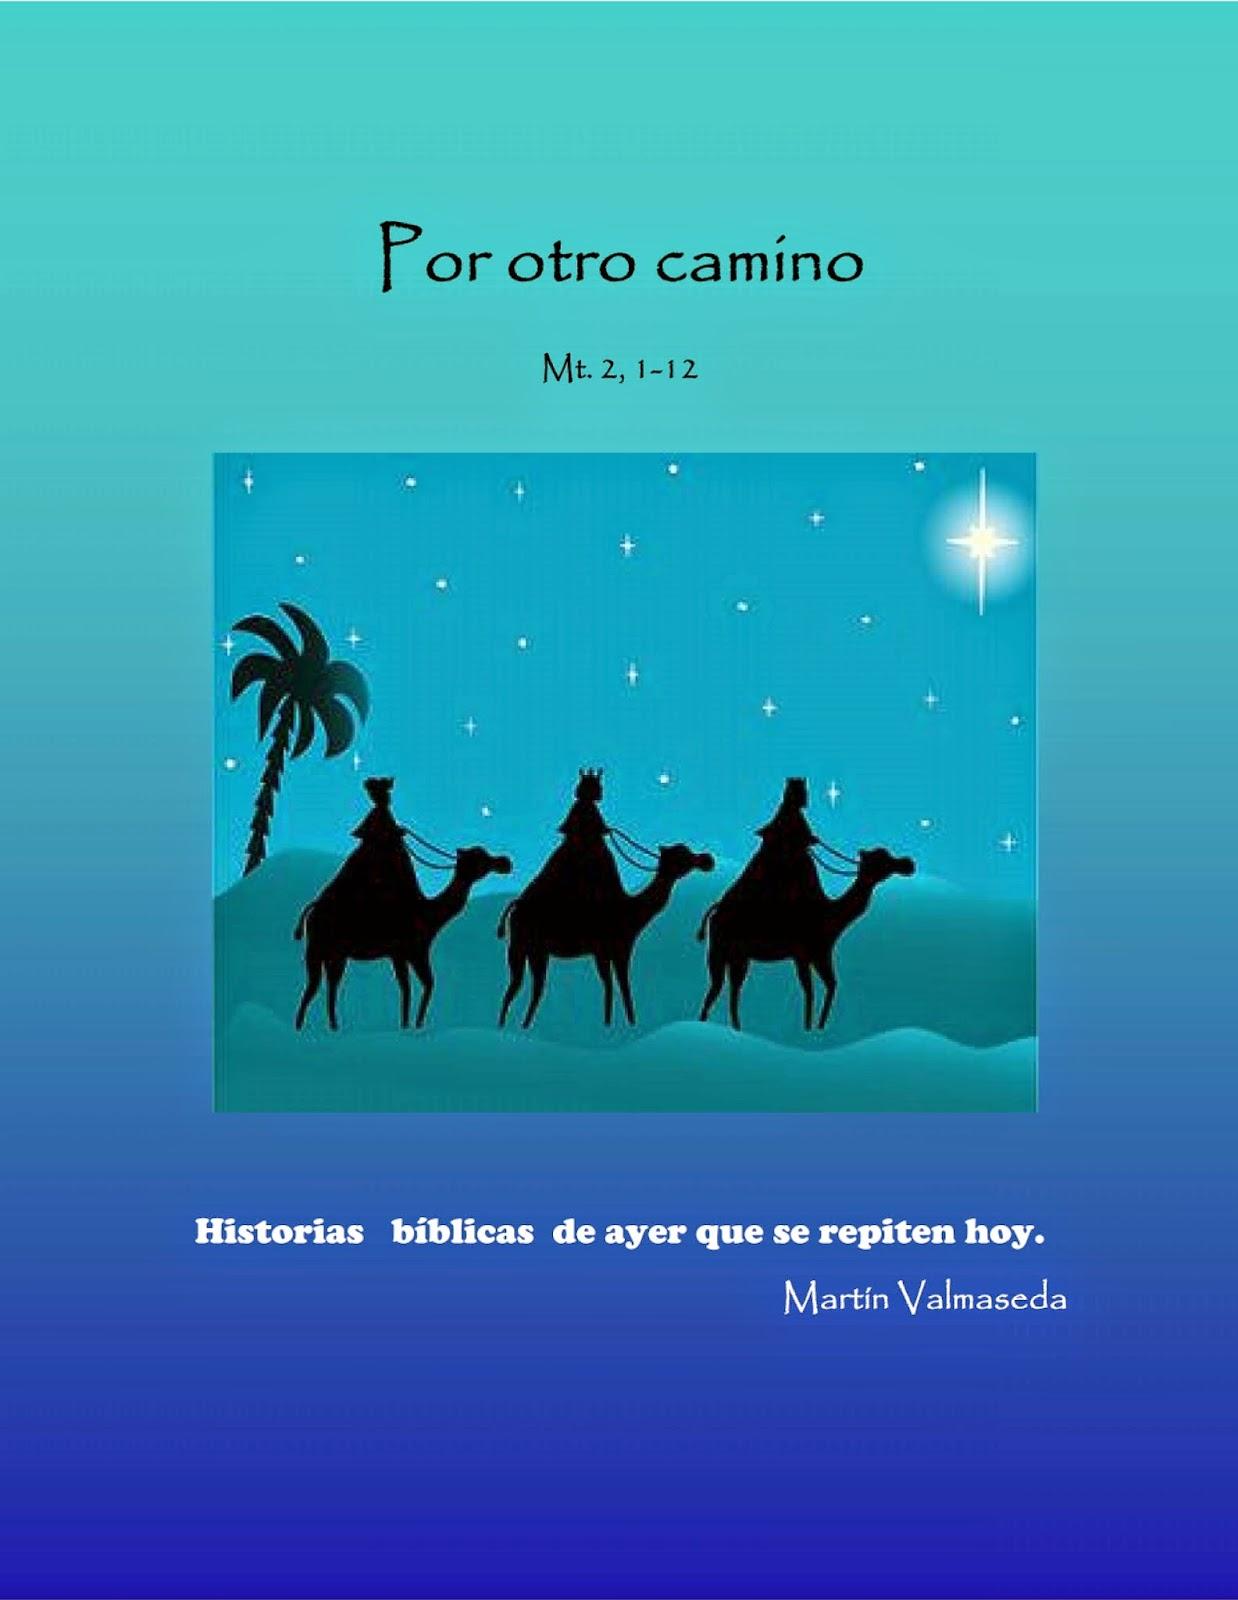 http://martinvalmasedasantillana.blogspot.com/2015/01/volvieron-por-otro-camino.html